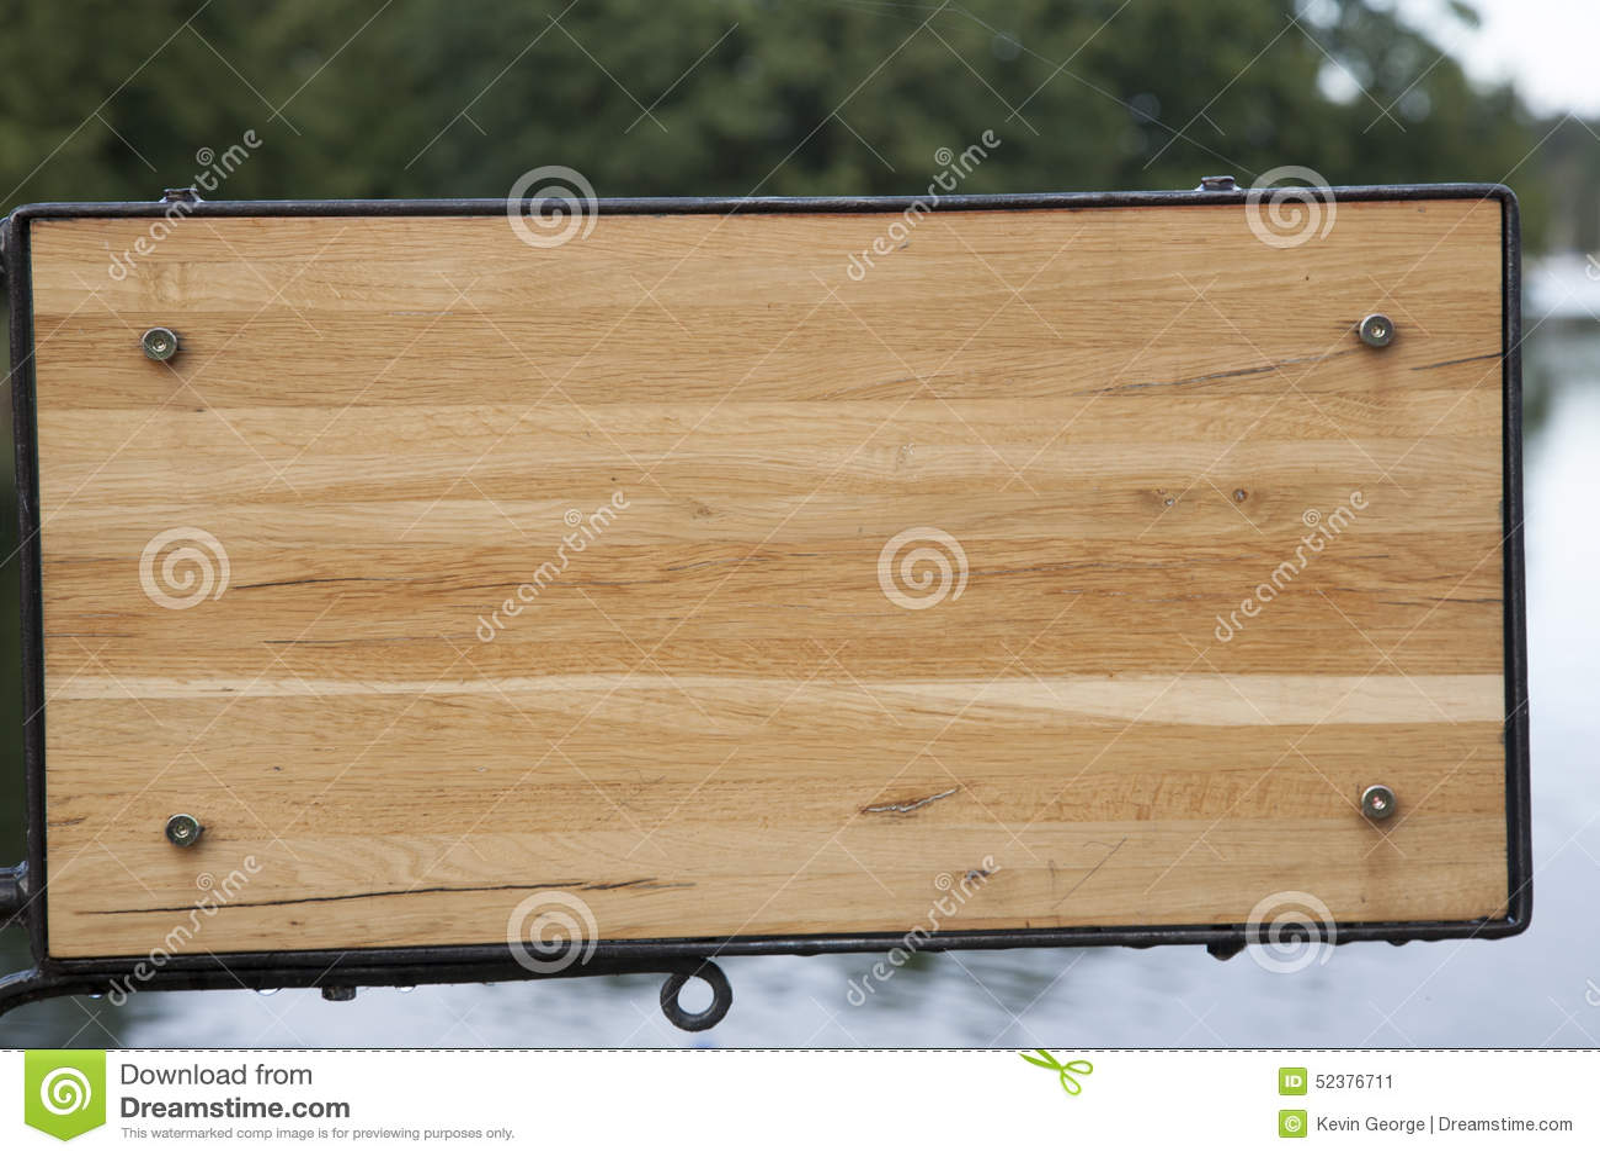 blank wooden sign board royaltyfree stock photo